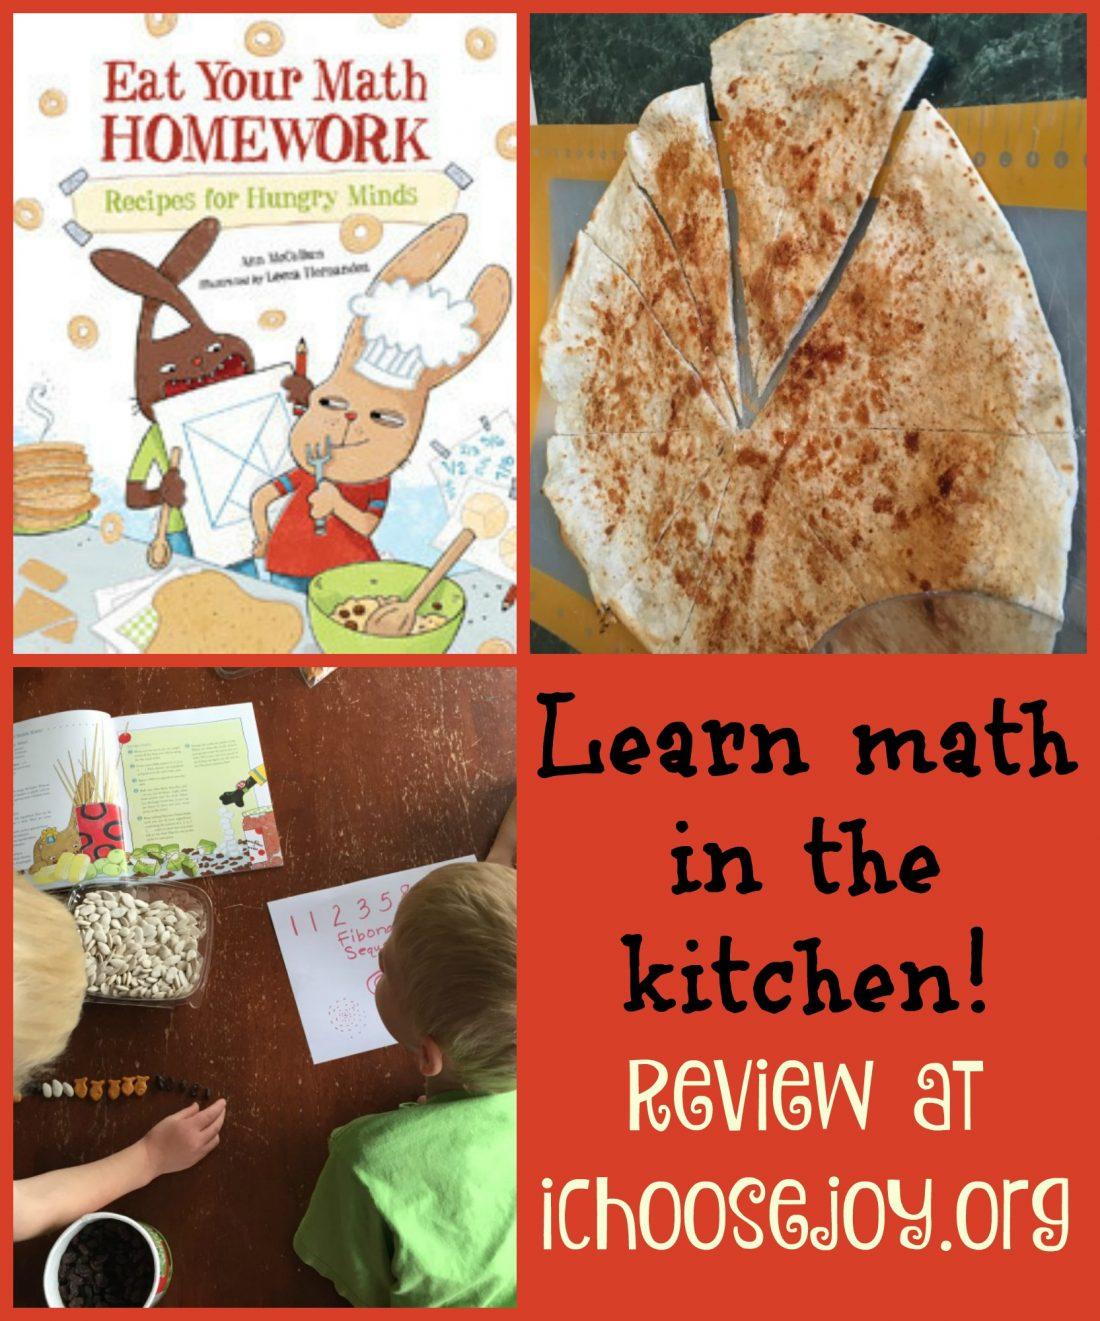 Review: Eat Your Math Homework